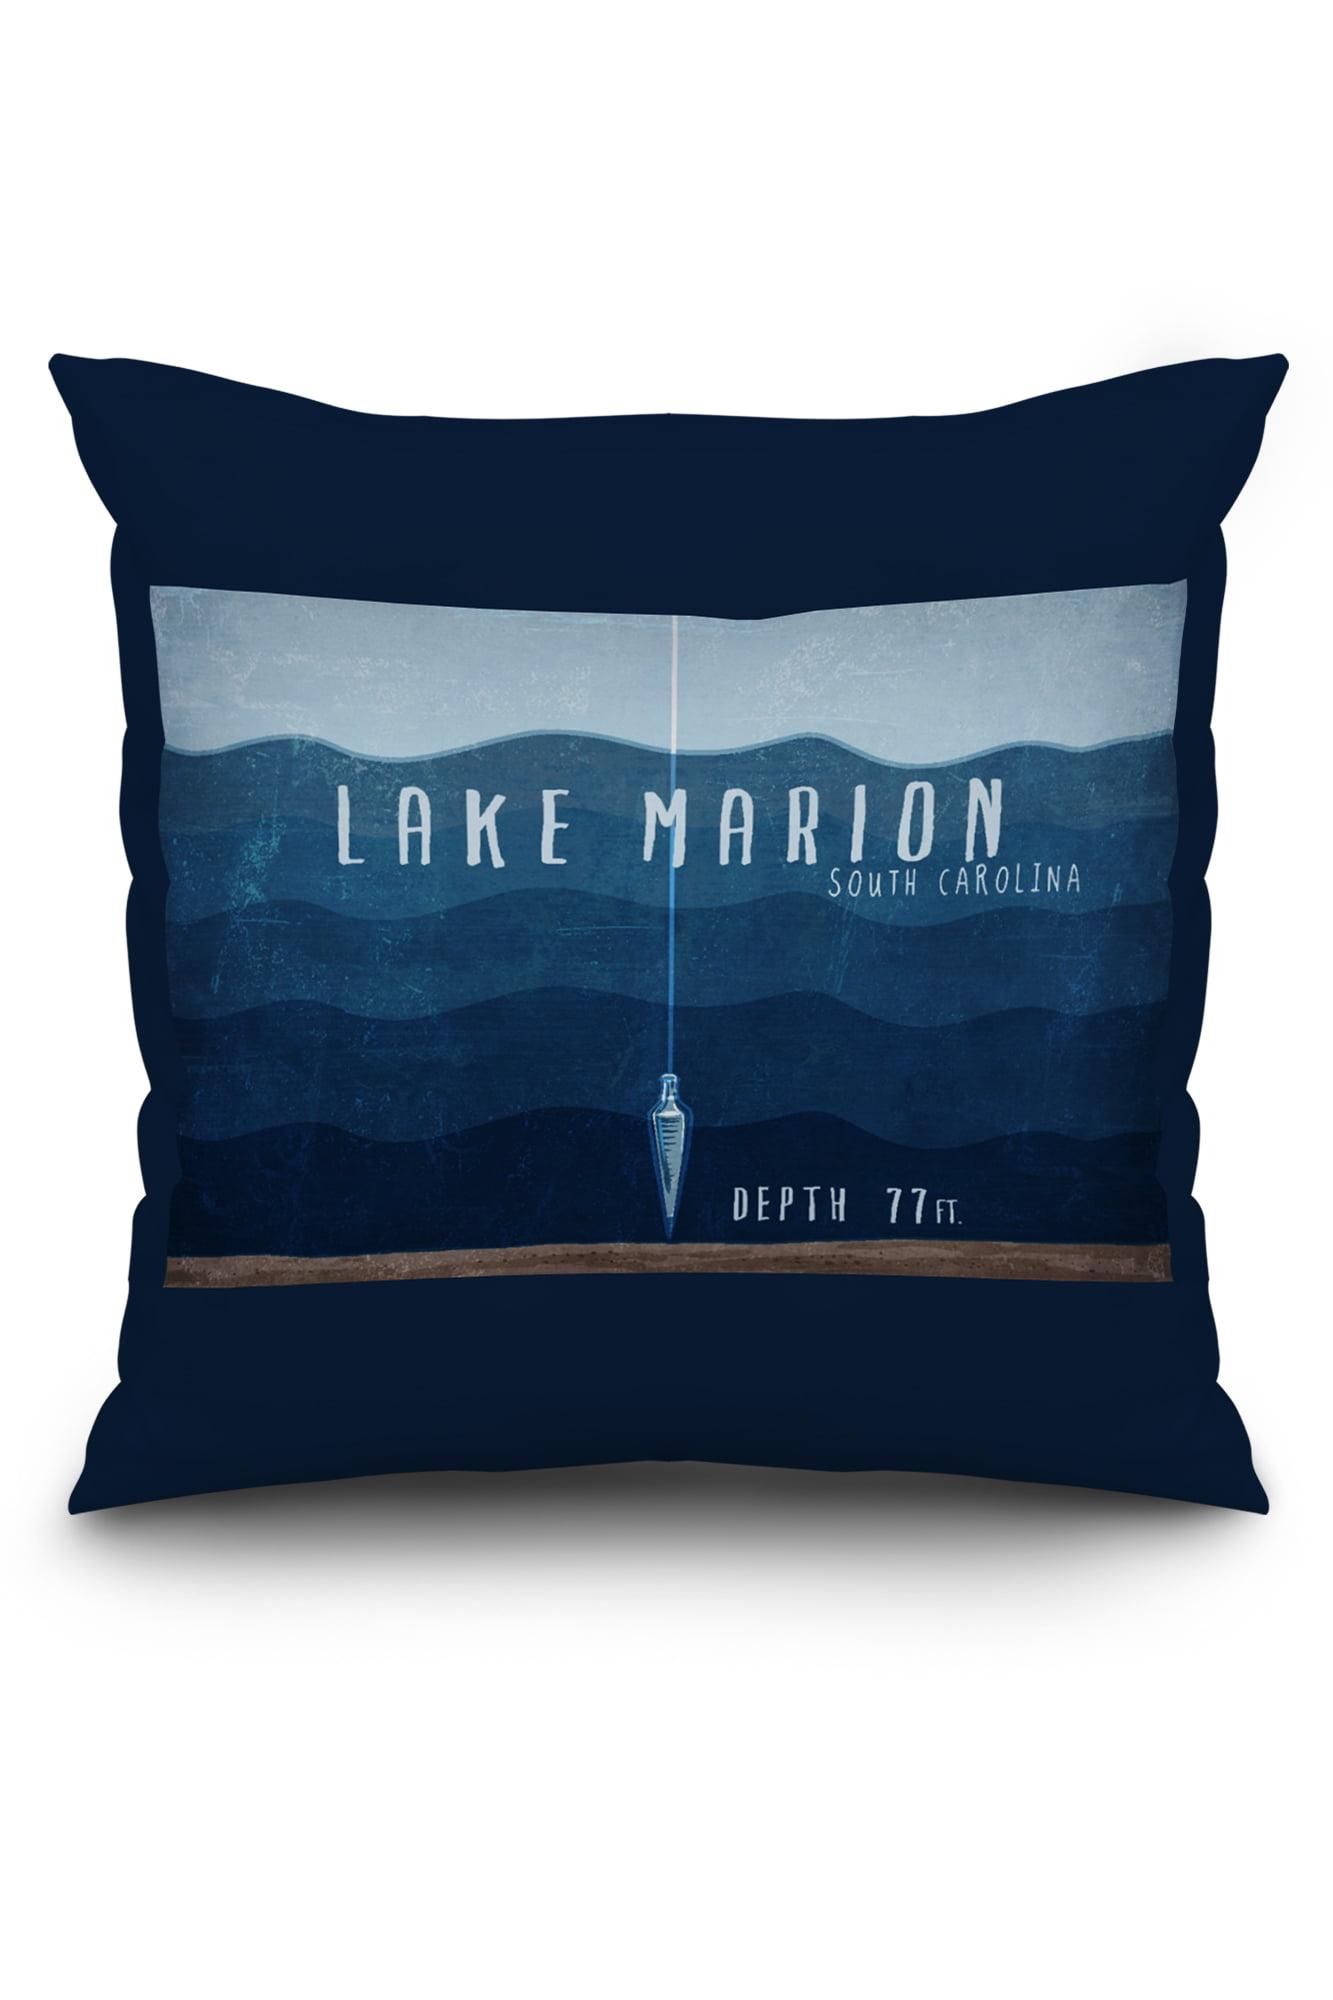 Lake Marion, South Carolina - Lake Essentials - Lake Depth - Lantern Press  Artwork (16x16 Spun Polyester Pillow, Black Border)